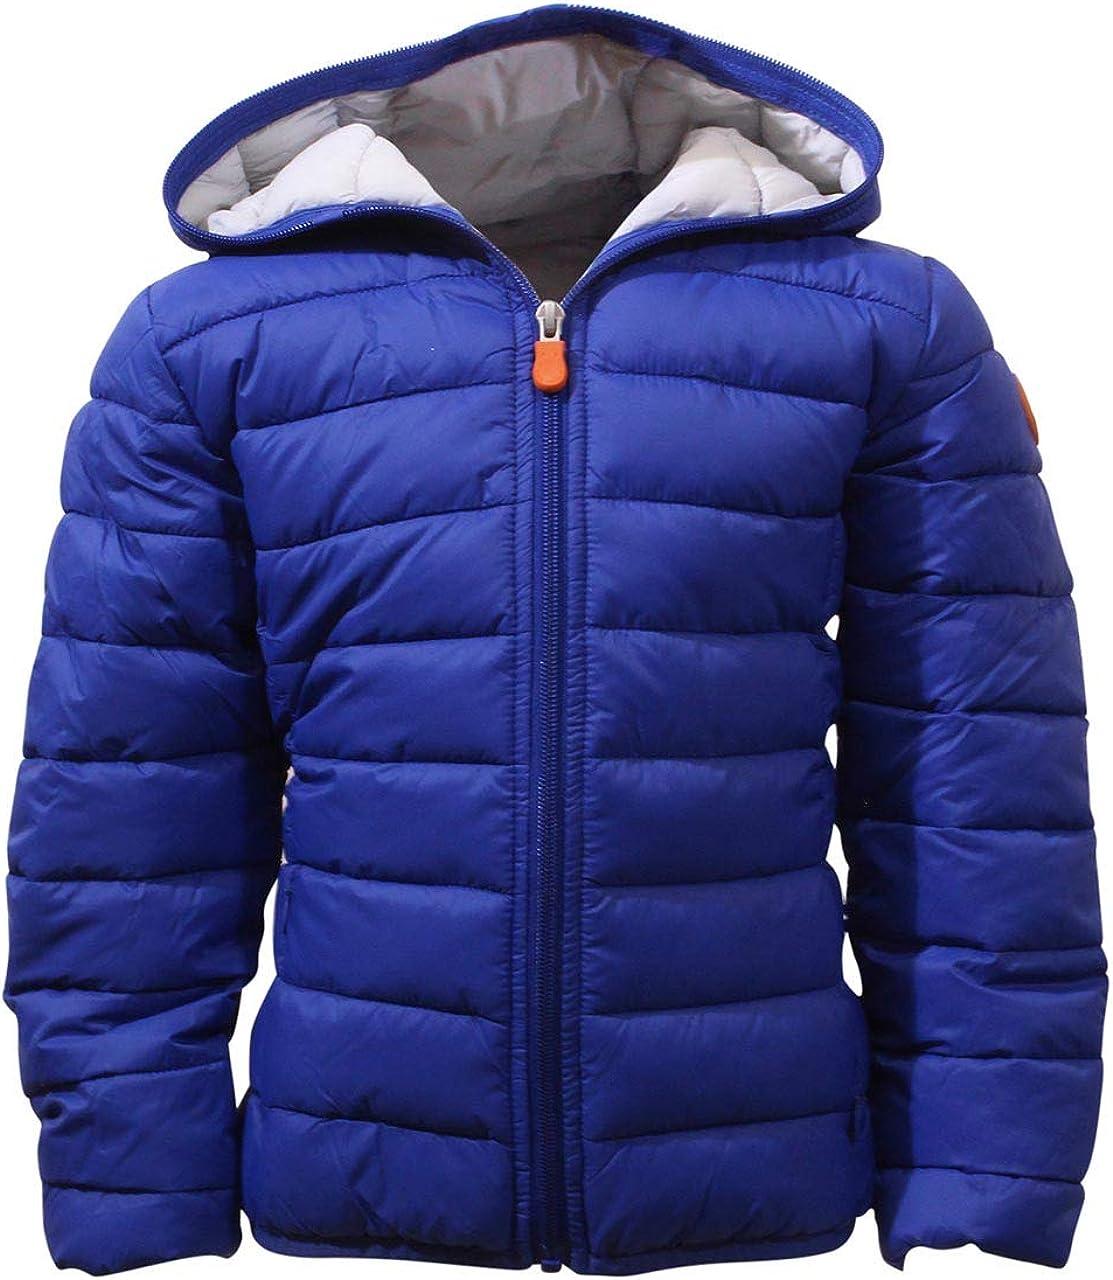 Save The Duck Little/Big Boy's Giga Hooded Long Sleeve Puffer Jacket